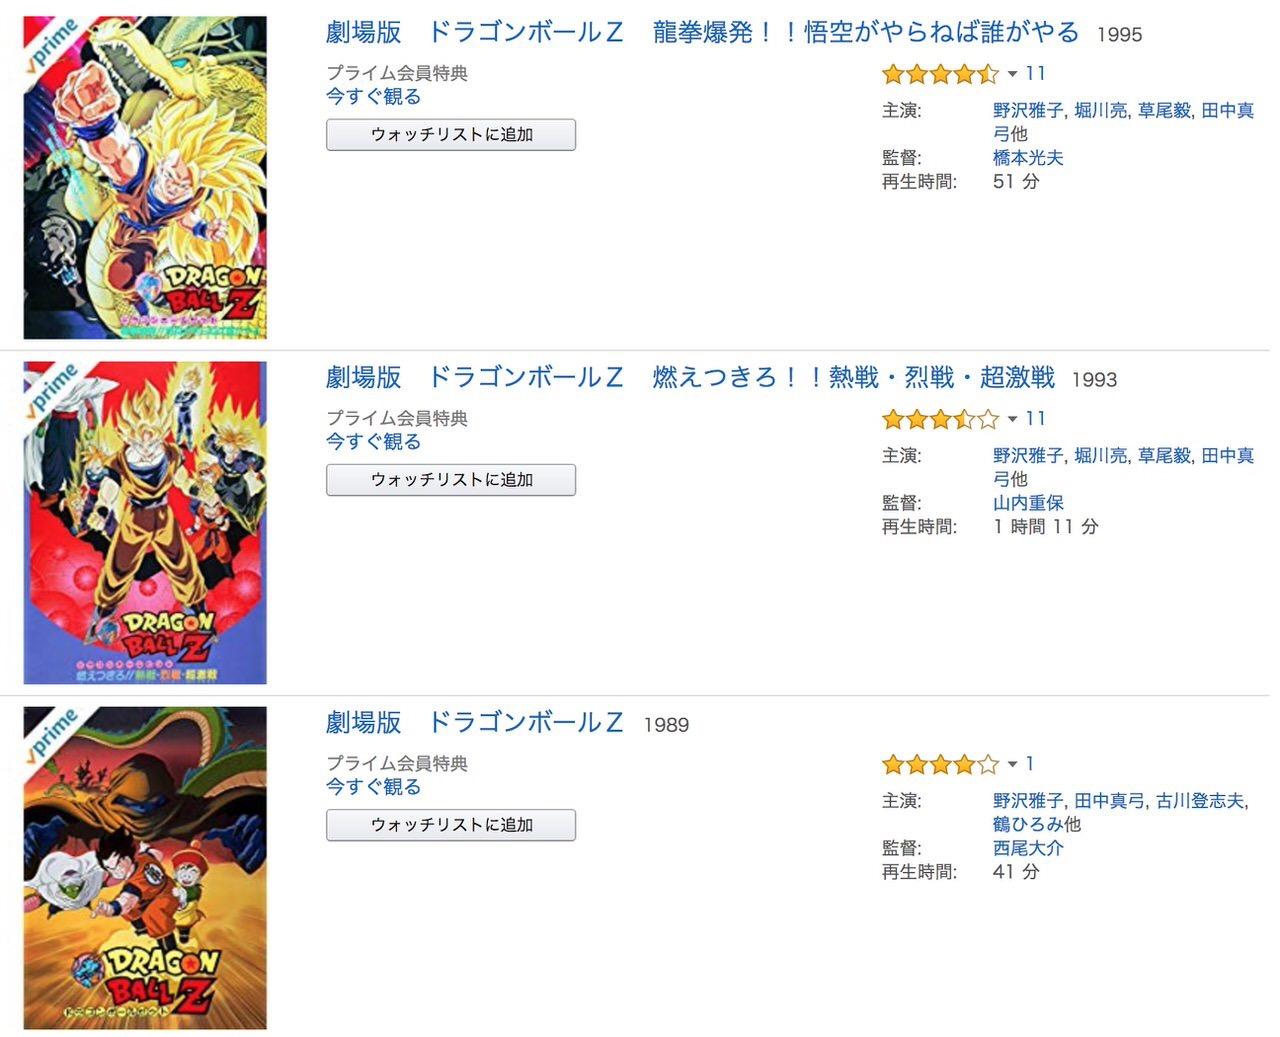 Amazonプライムビデオ「劇場版ドラゴンボール」19作が追加